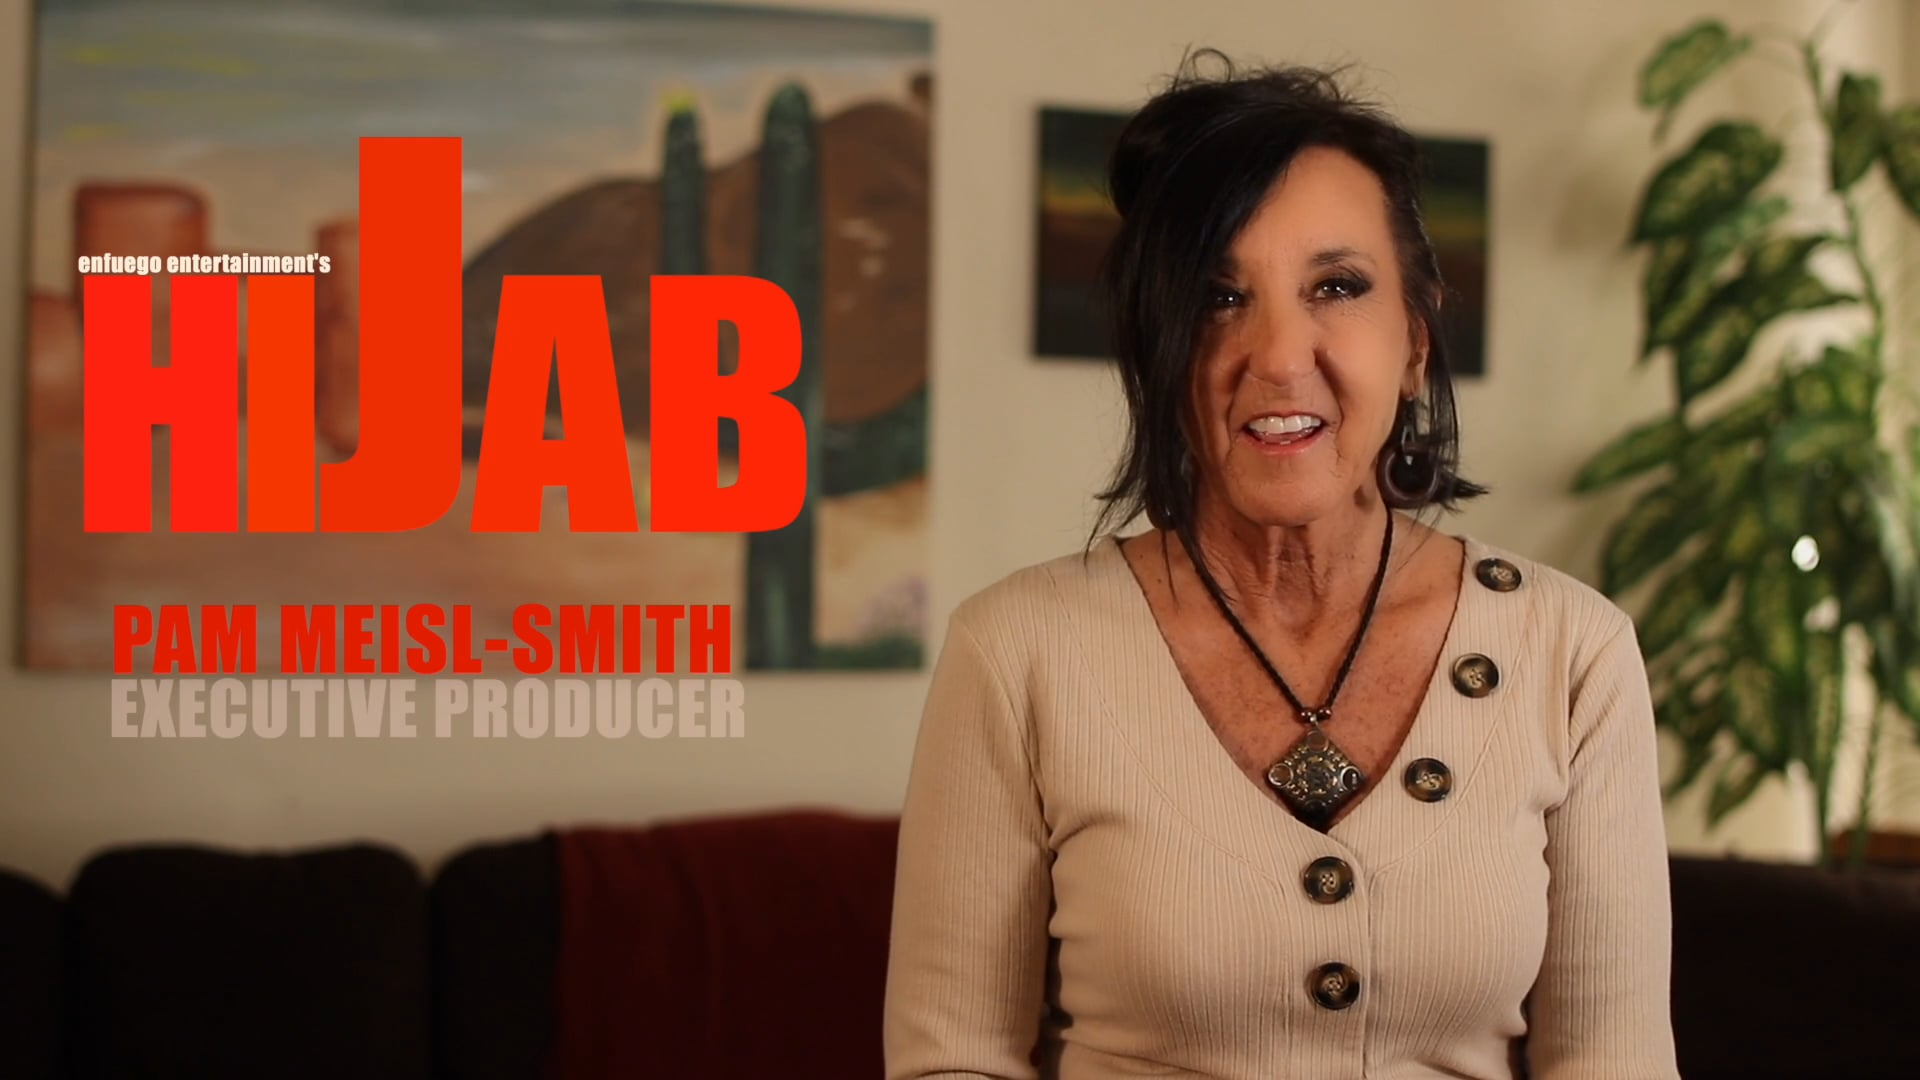 HIJAB INTERVIEWS - PAM MEISL SMITH #3